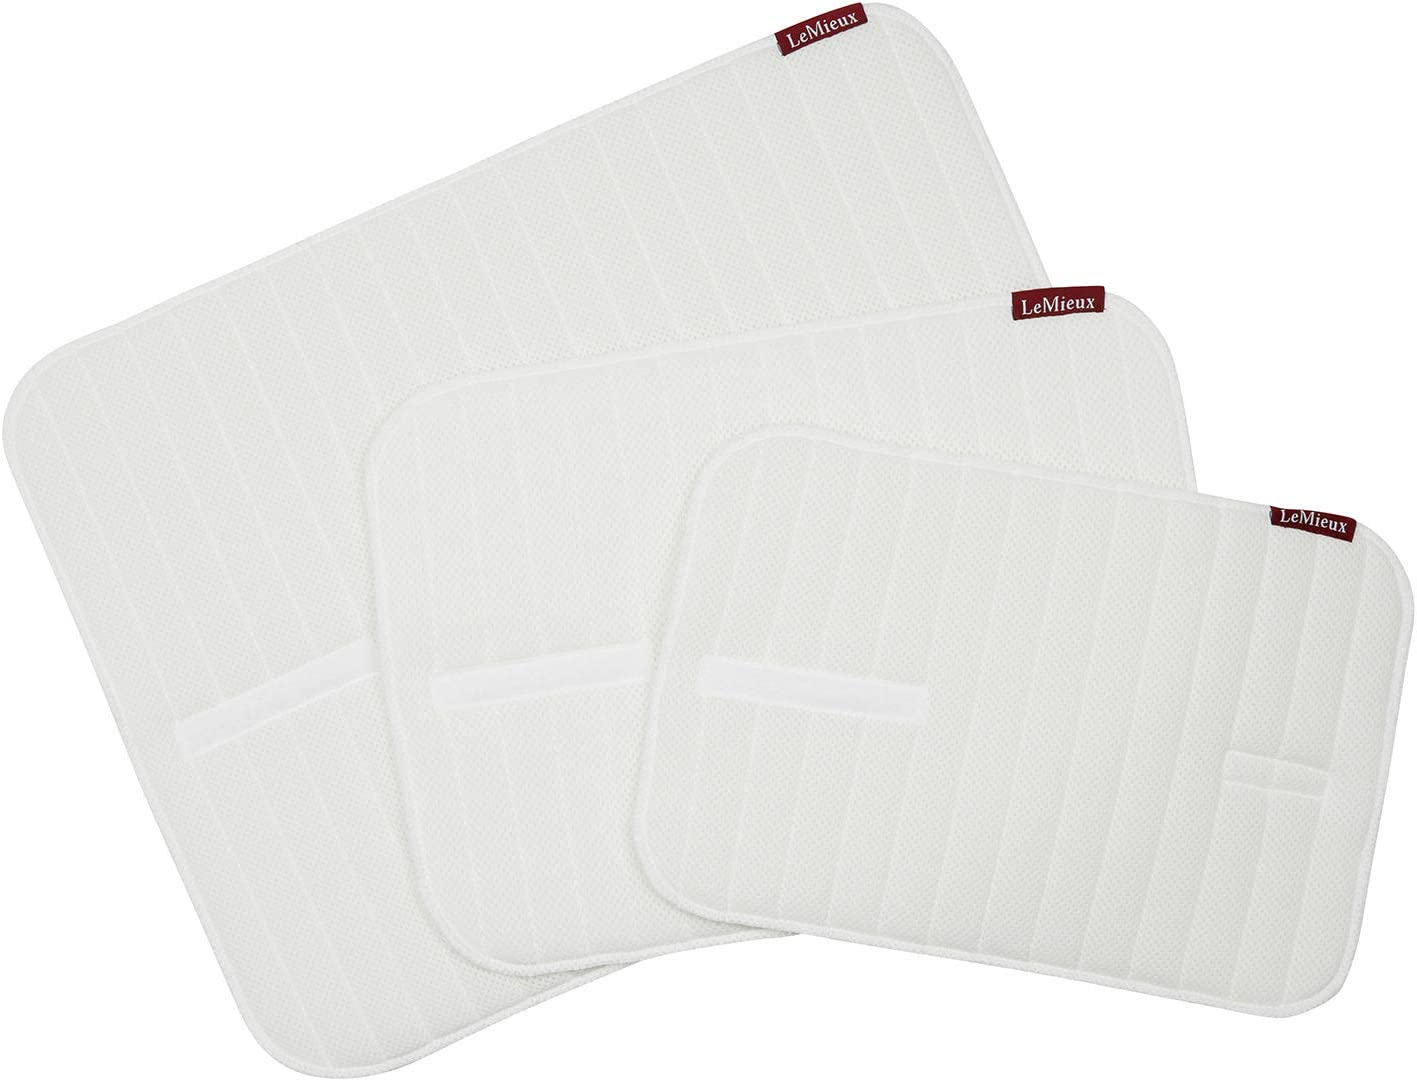 LeMieux Memory Foam Bandage Pads Pair Almohadillas de Vendaje, Unisex Adulto